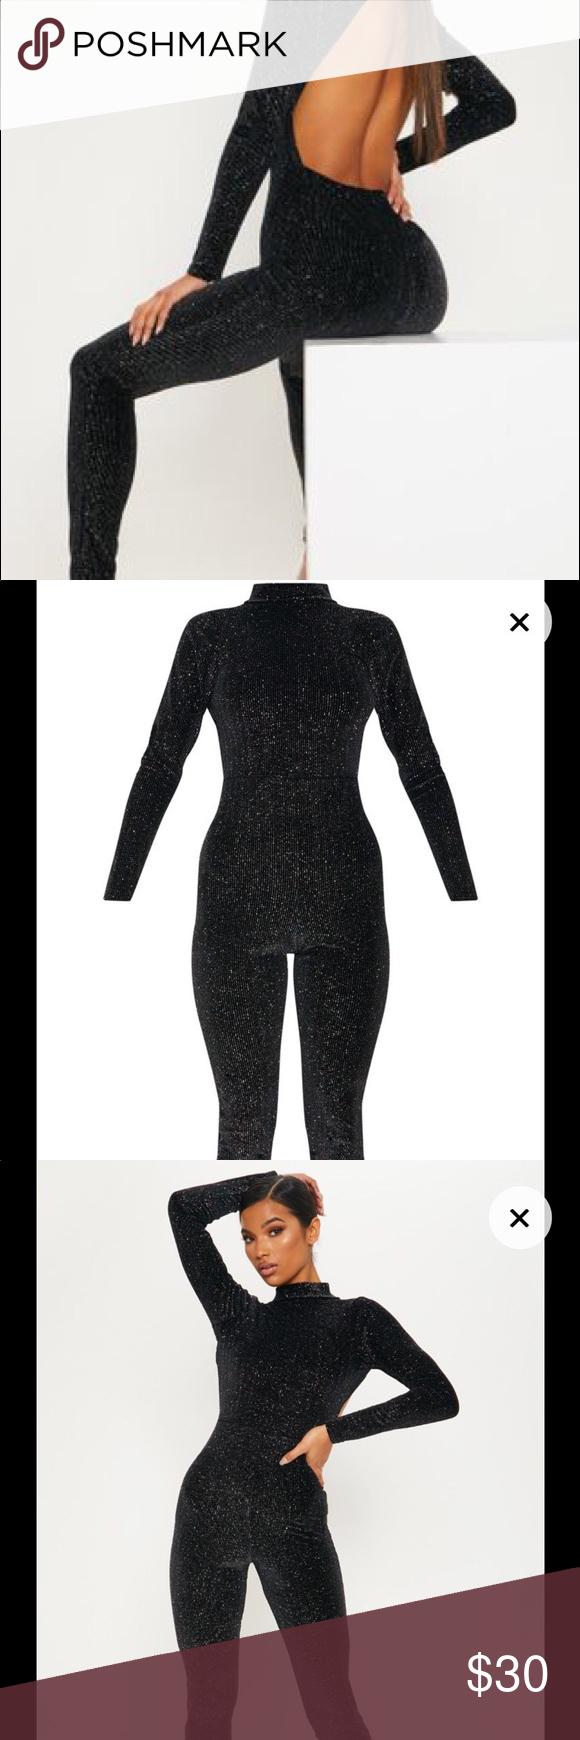 35706de04293 Pretty Little Thing Black Velvet Glitter Jumpsuit Black Velvet Glitter  Stripe Backless Jumpsuit Give your weekend